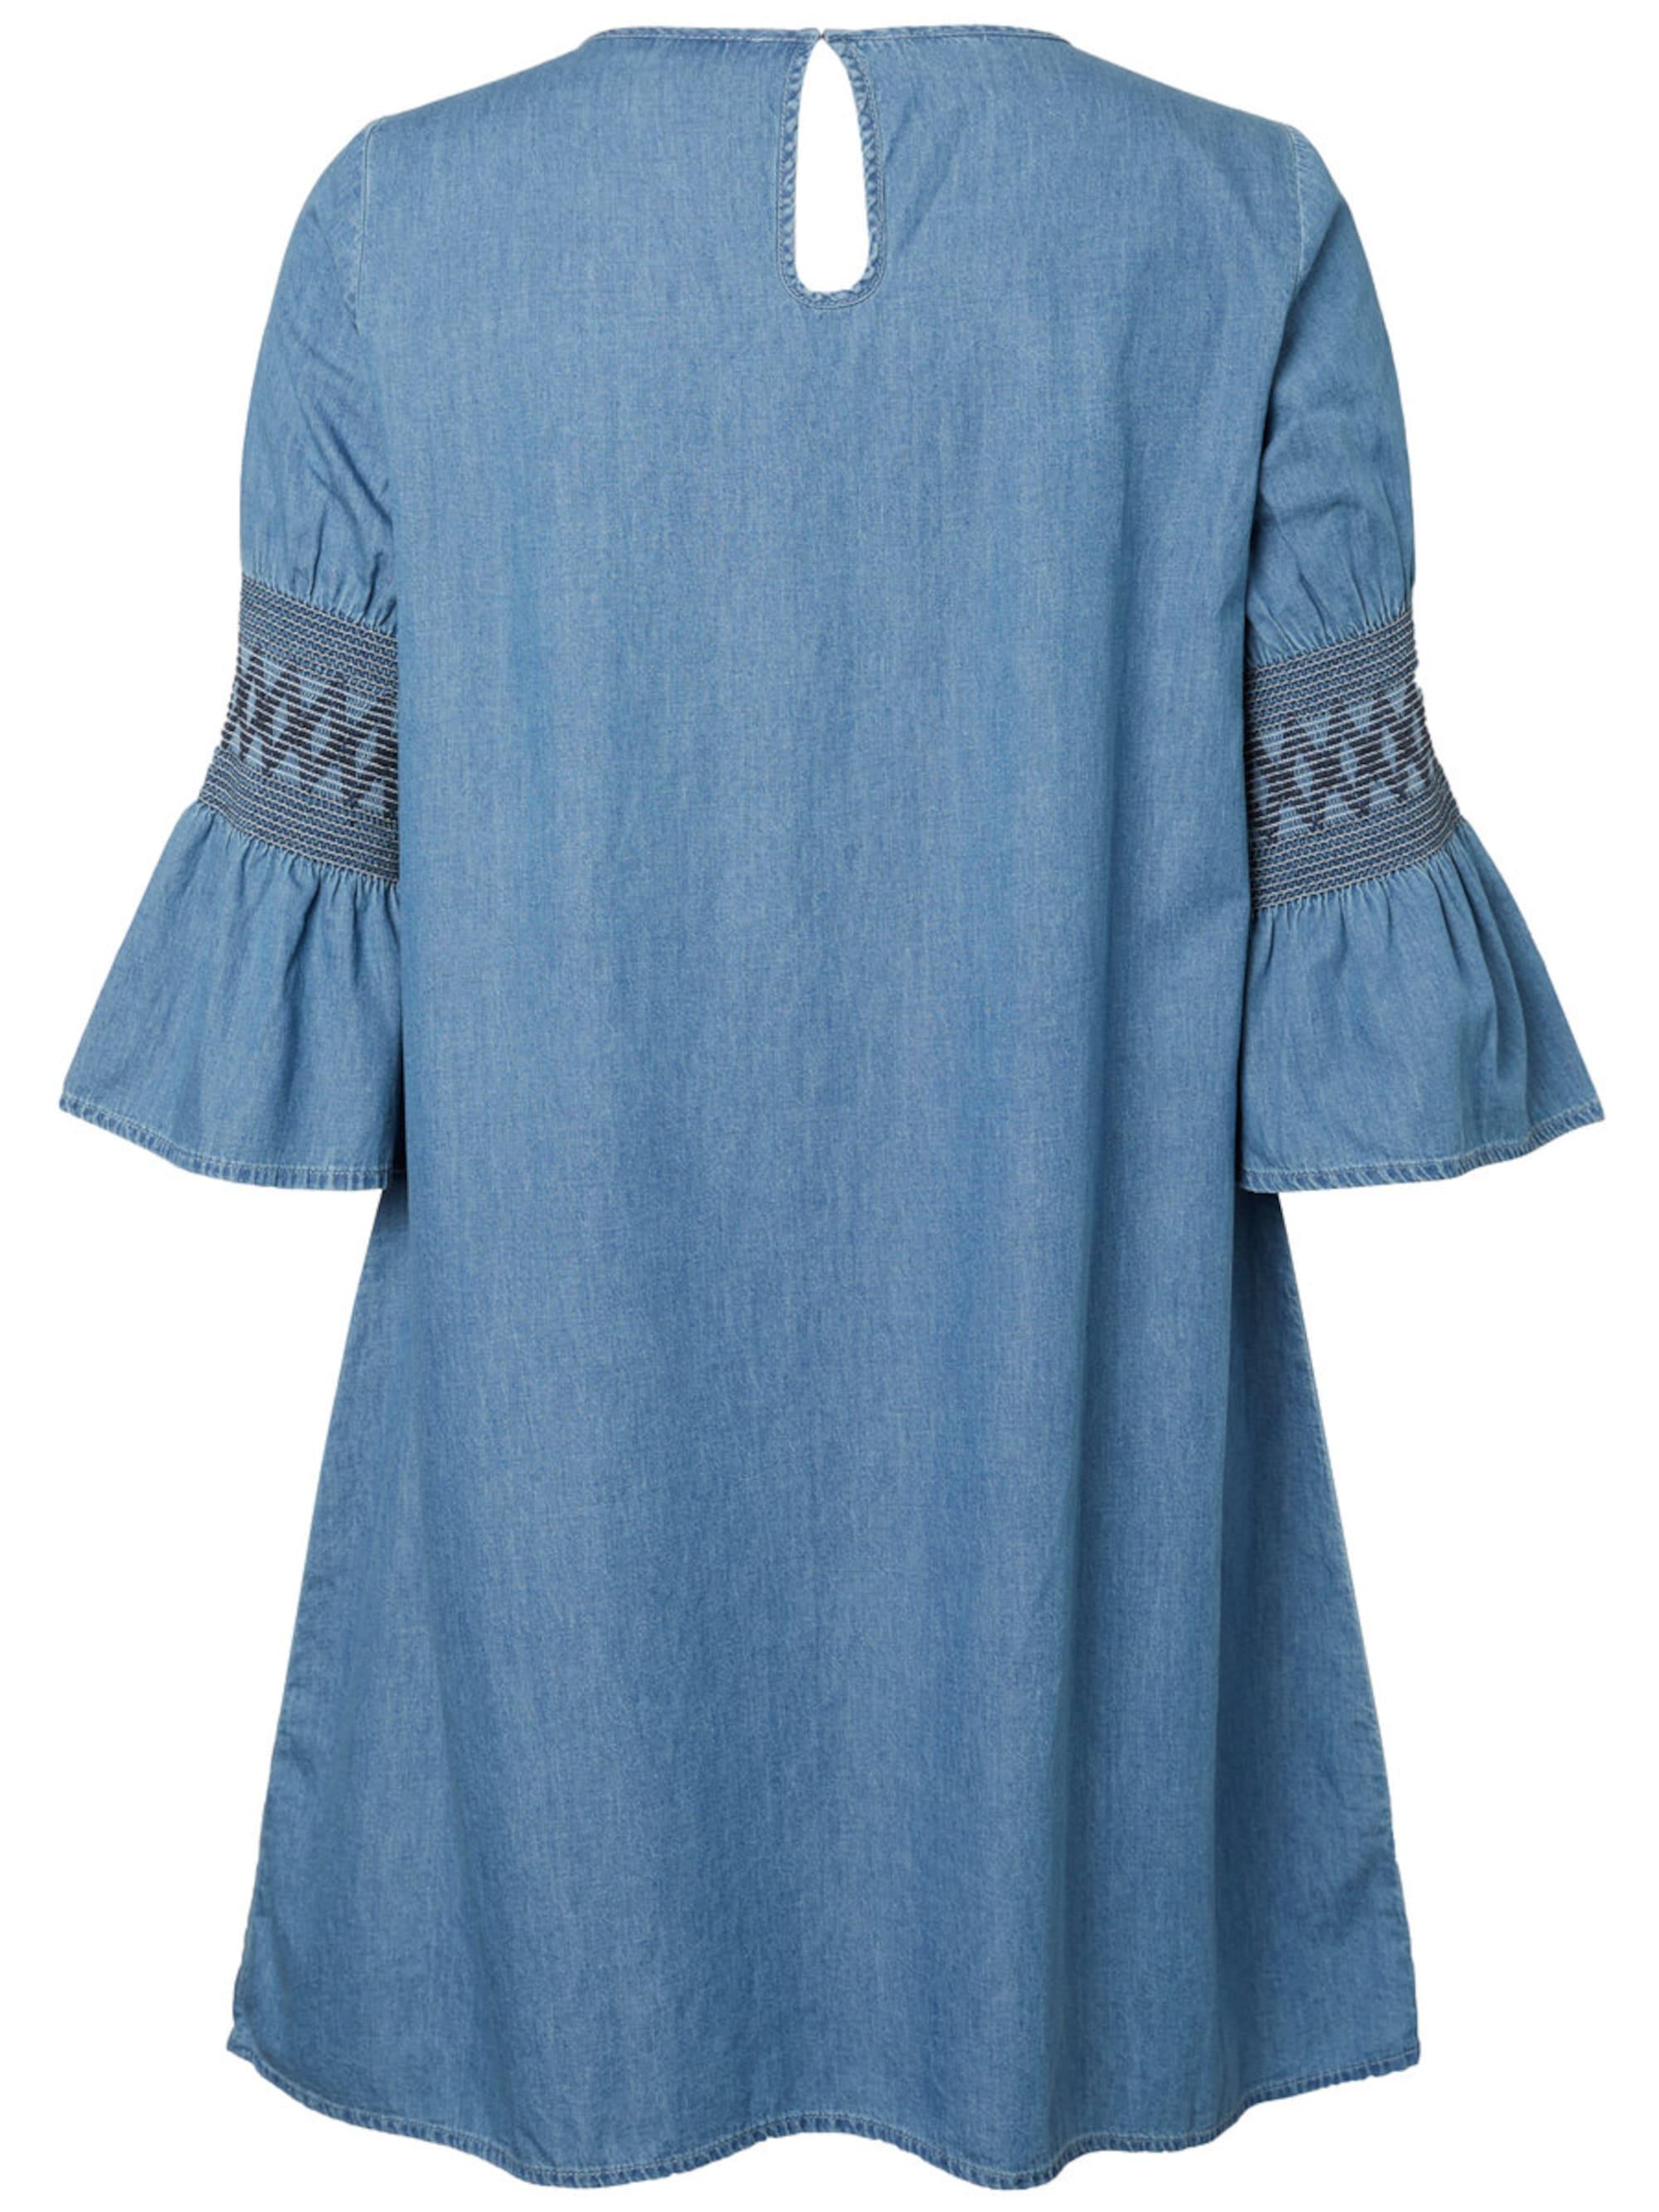 Junarose Sukienka 'Chambray'  niebieski denim